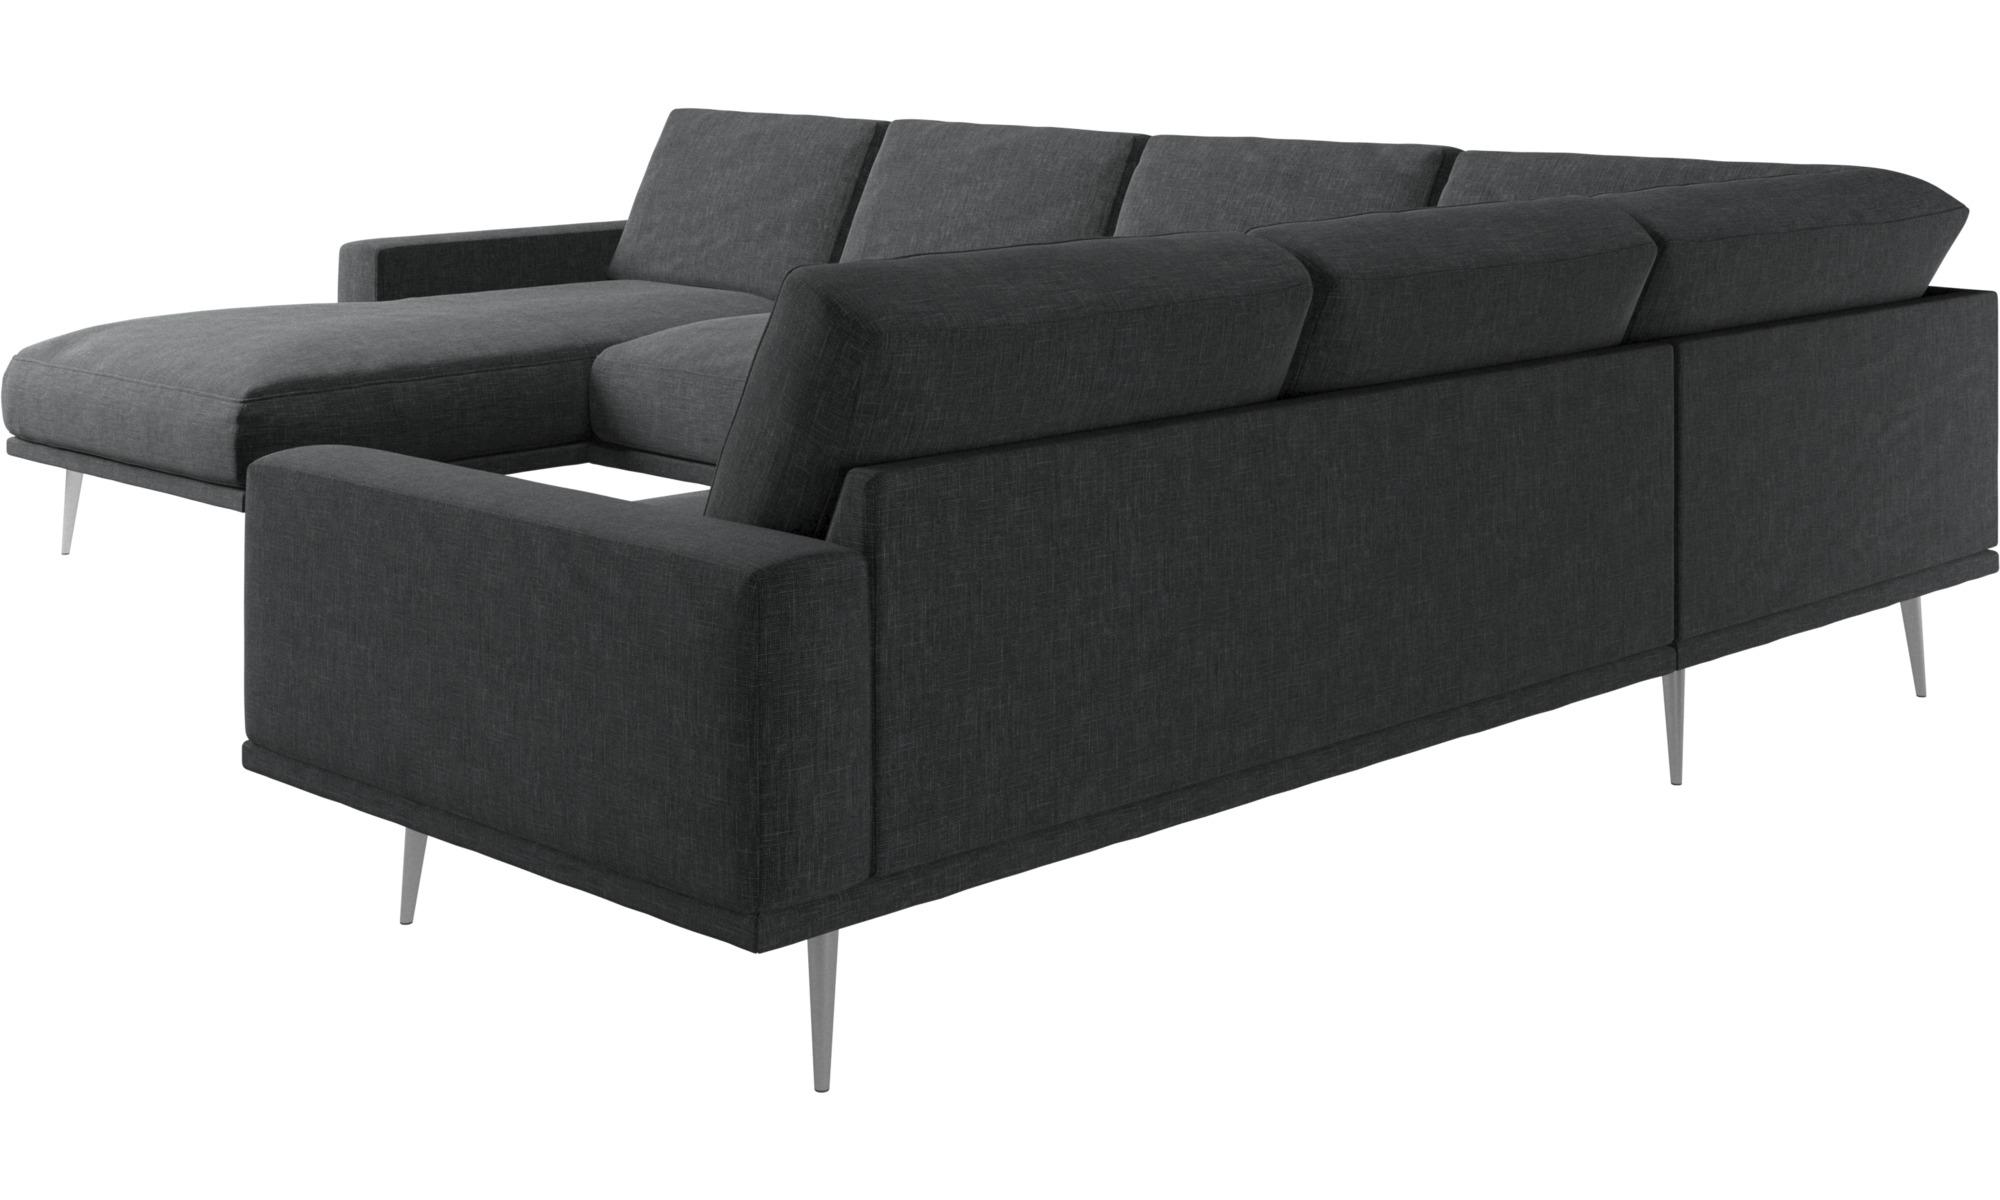 Hoekbank Chaise Lounge.Carlton Hoekbank Met Ligelement